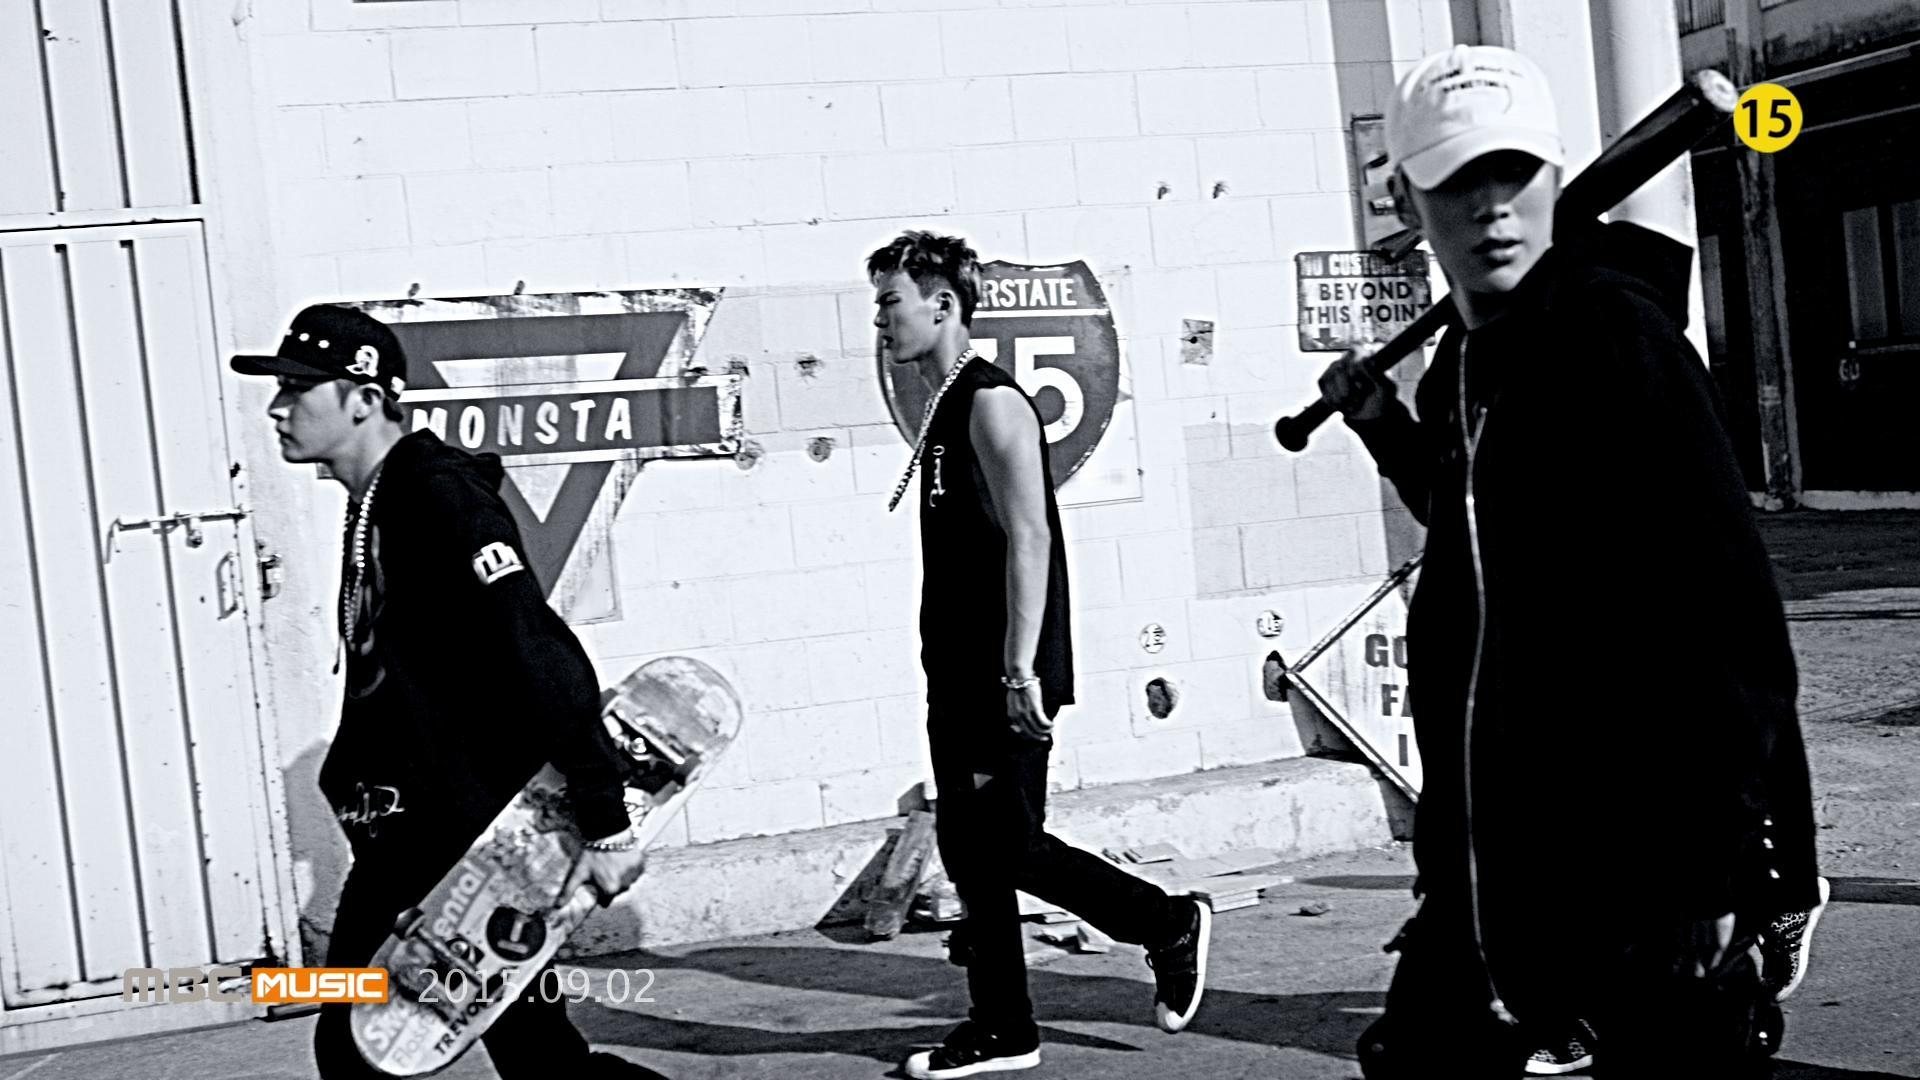 [Teaser] Monsta X(몬스타엑스)_신속히(Rush)